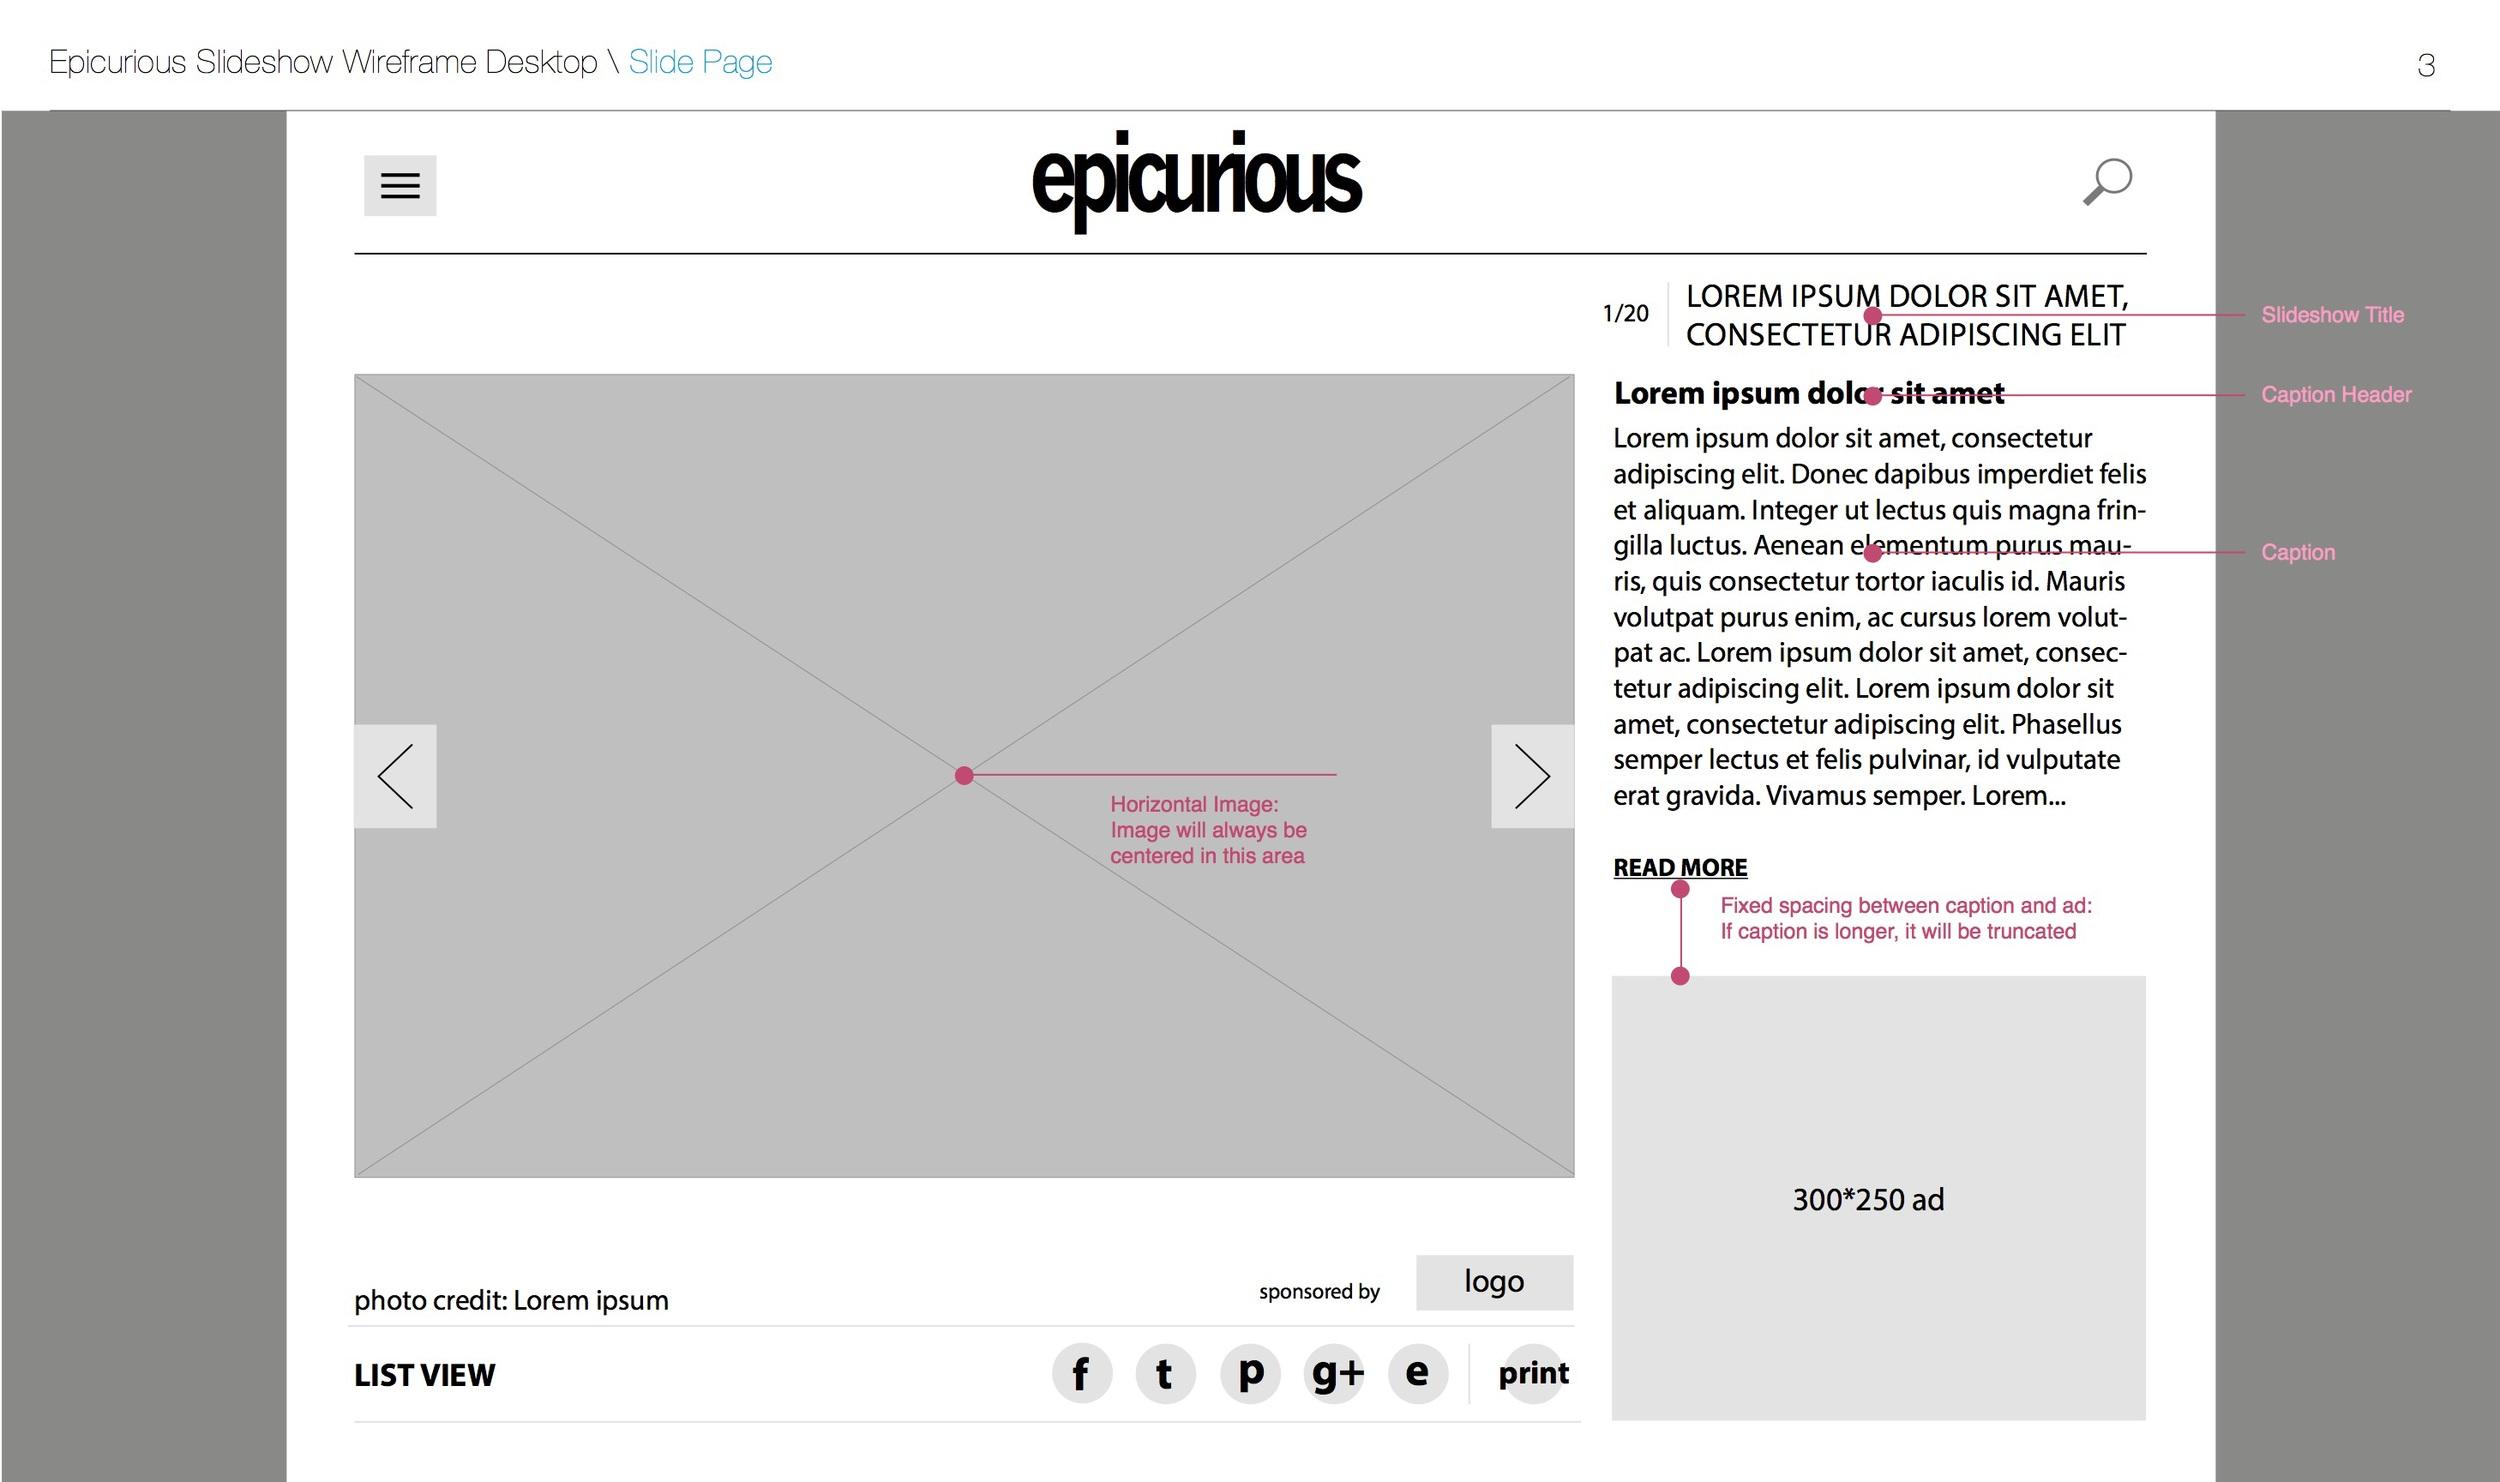 Epi_Slideshow_Wires_V4_2.jpg